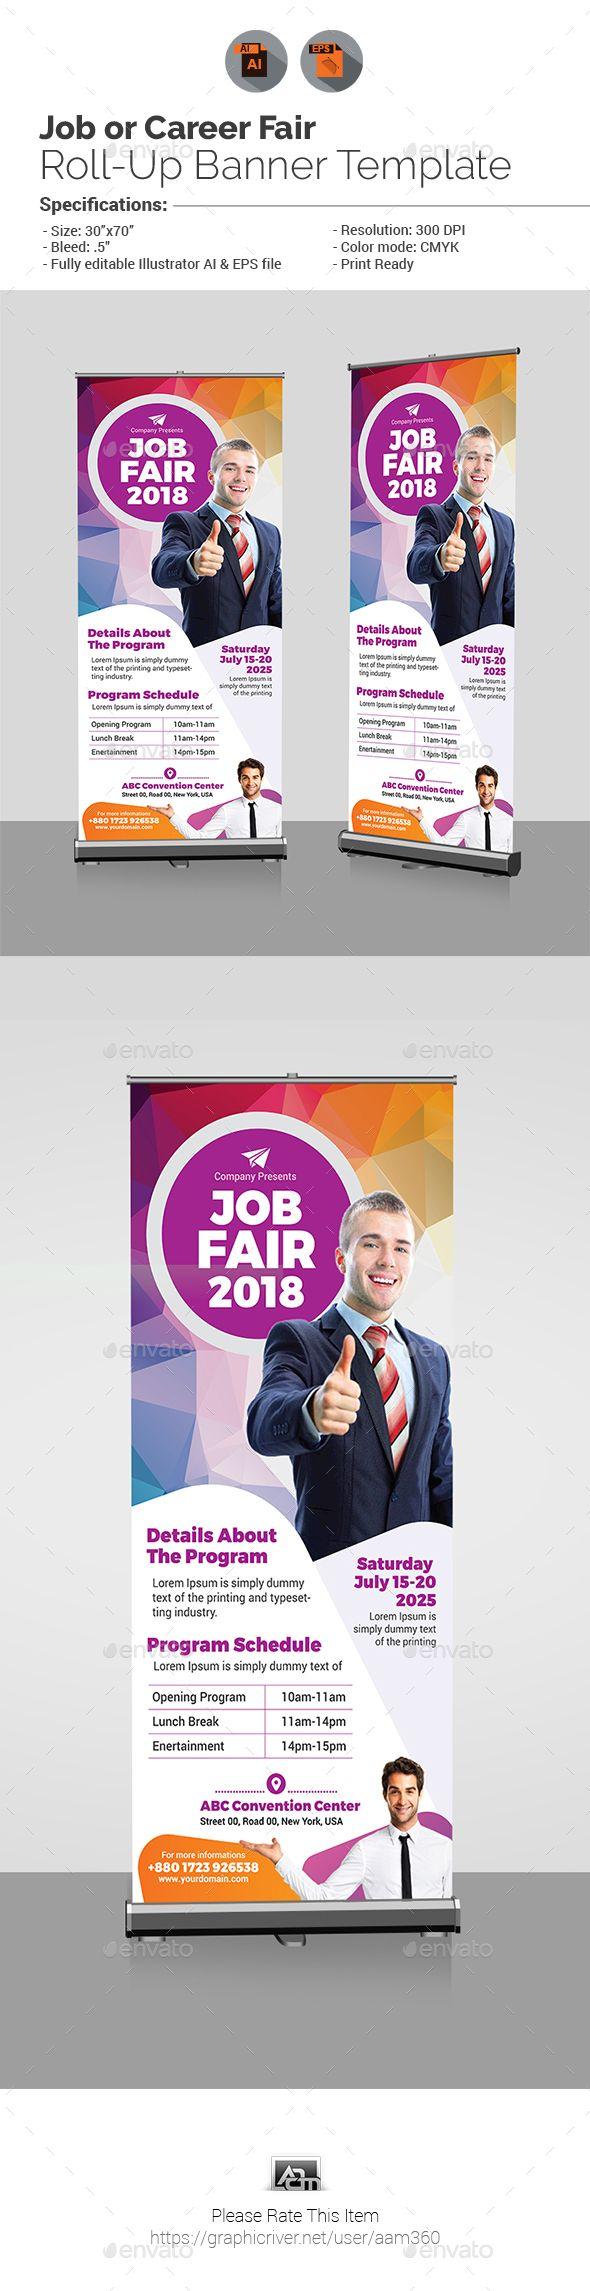 Design large banner in illustrator - Job Fair Roll Up Banner Template